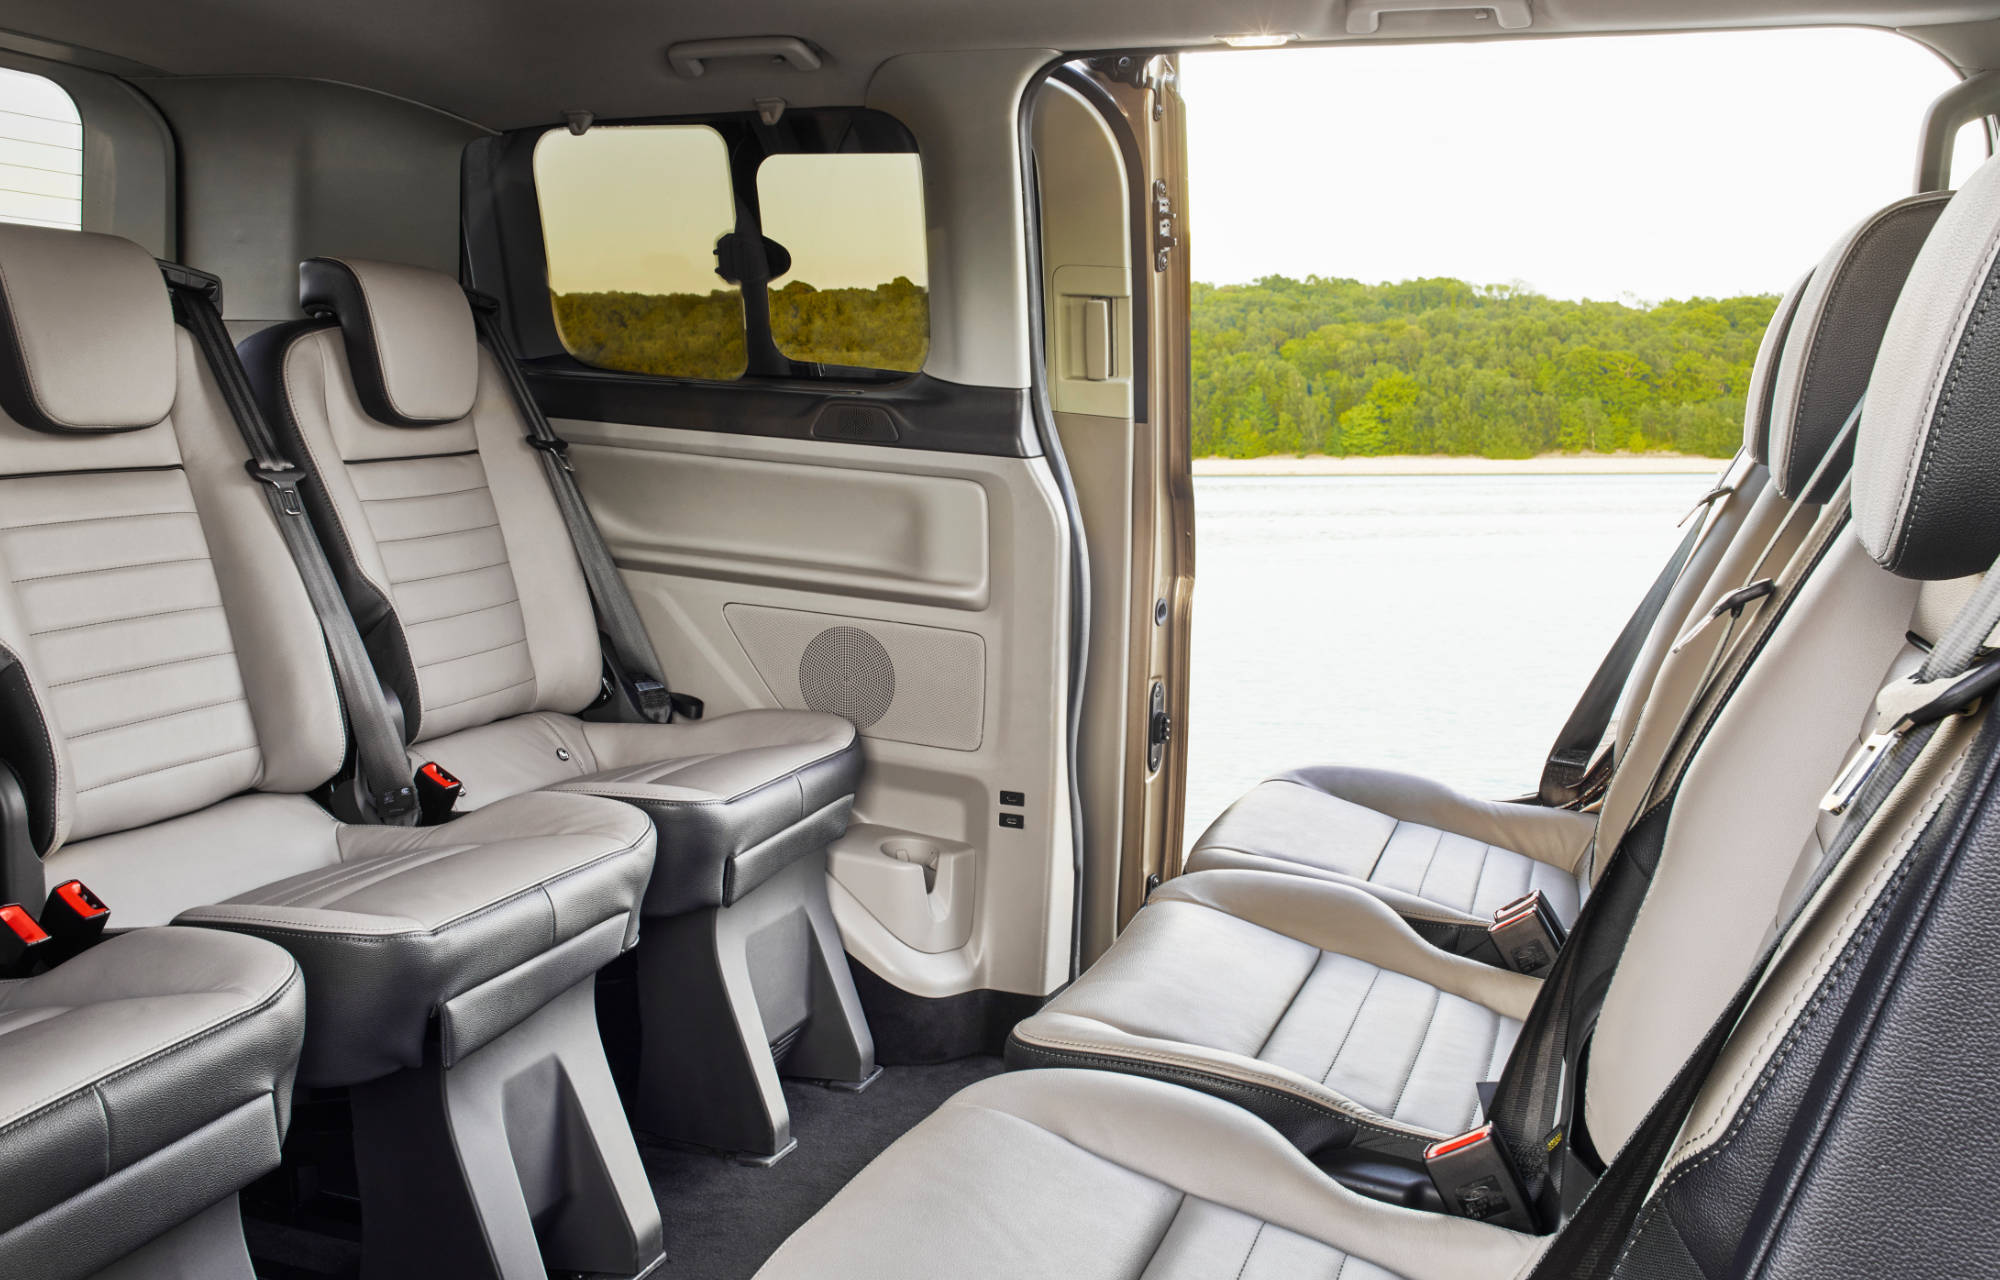 Ford Tourneo Custom Interiør Bilde